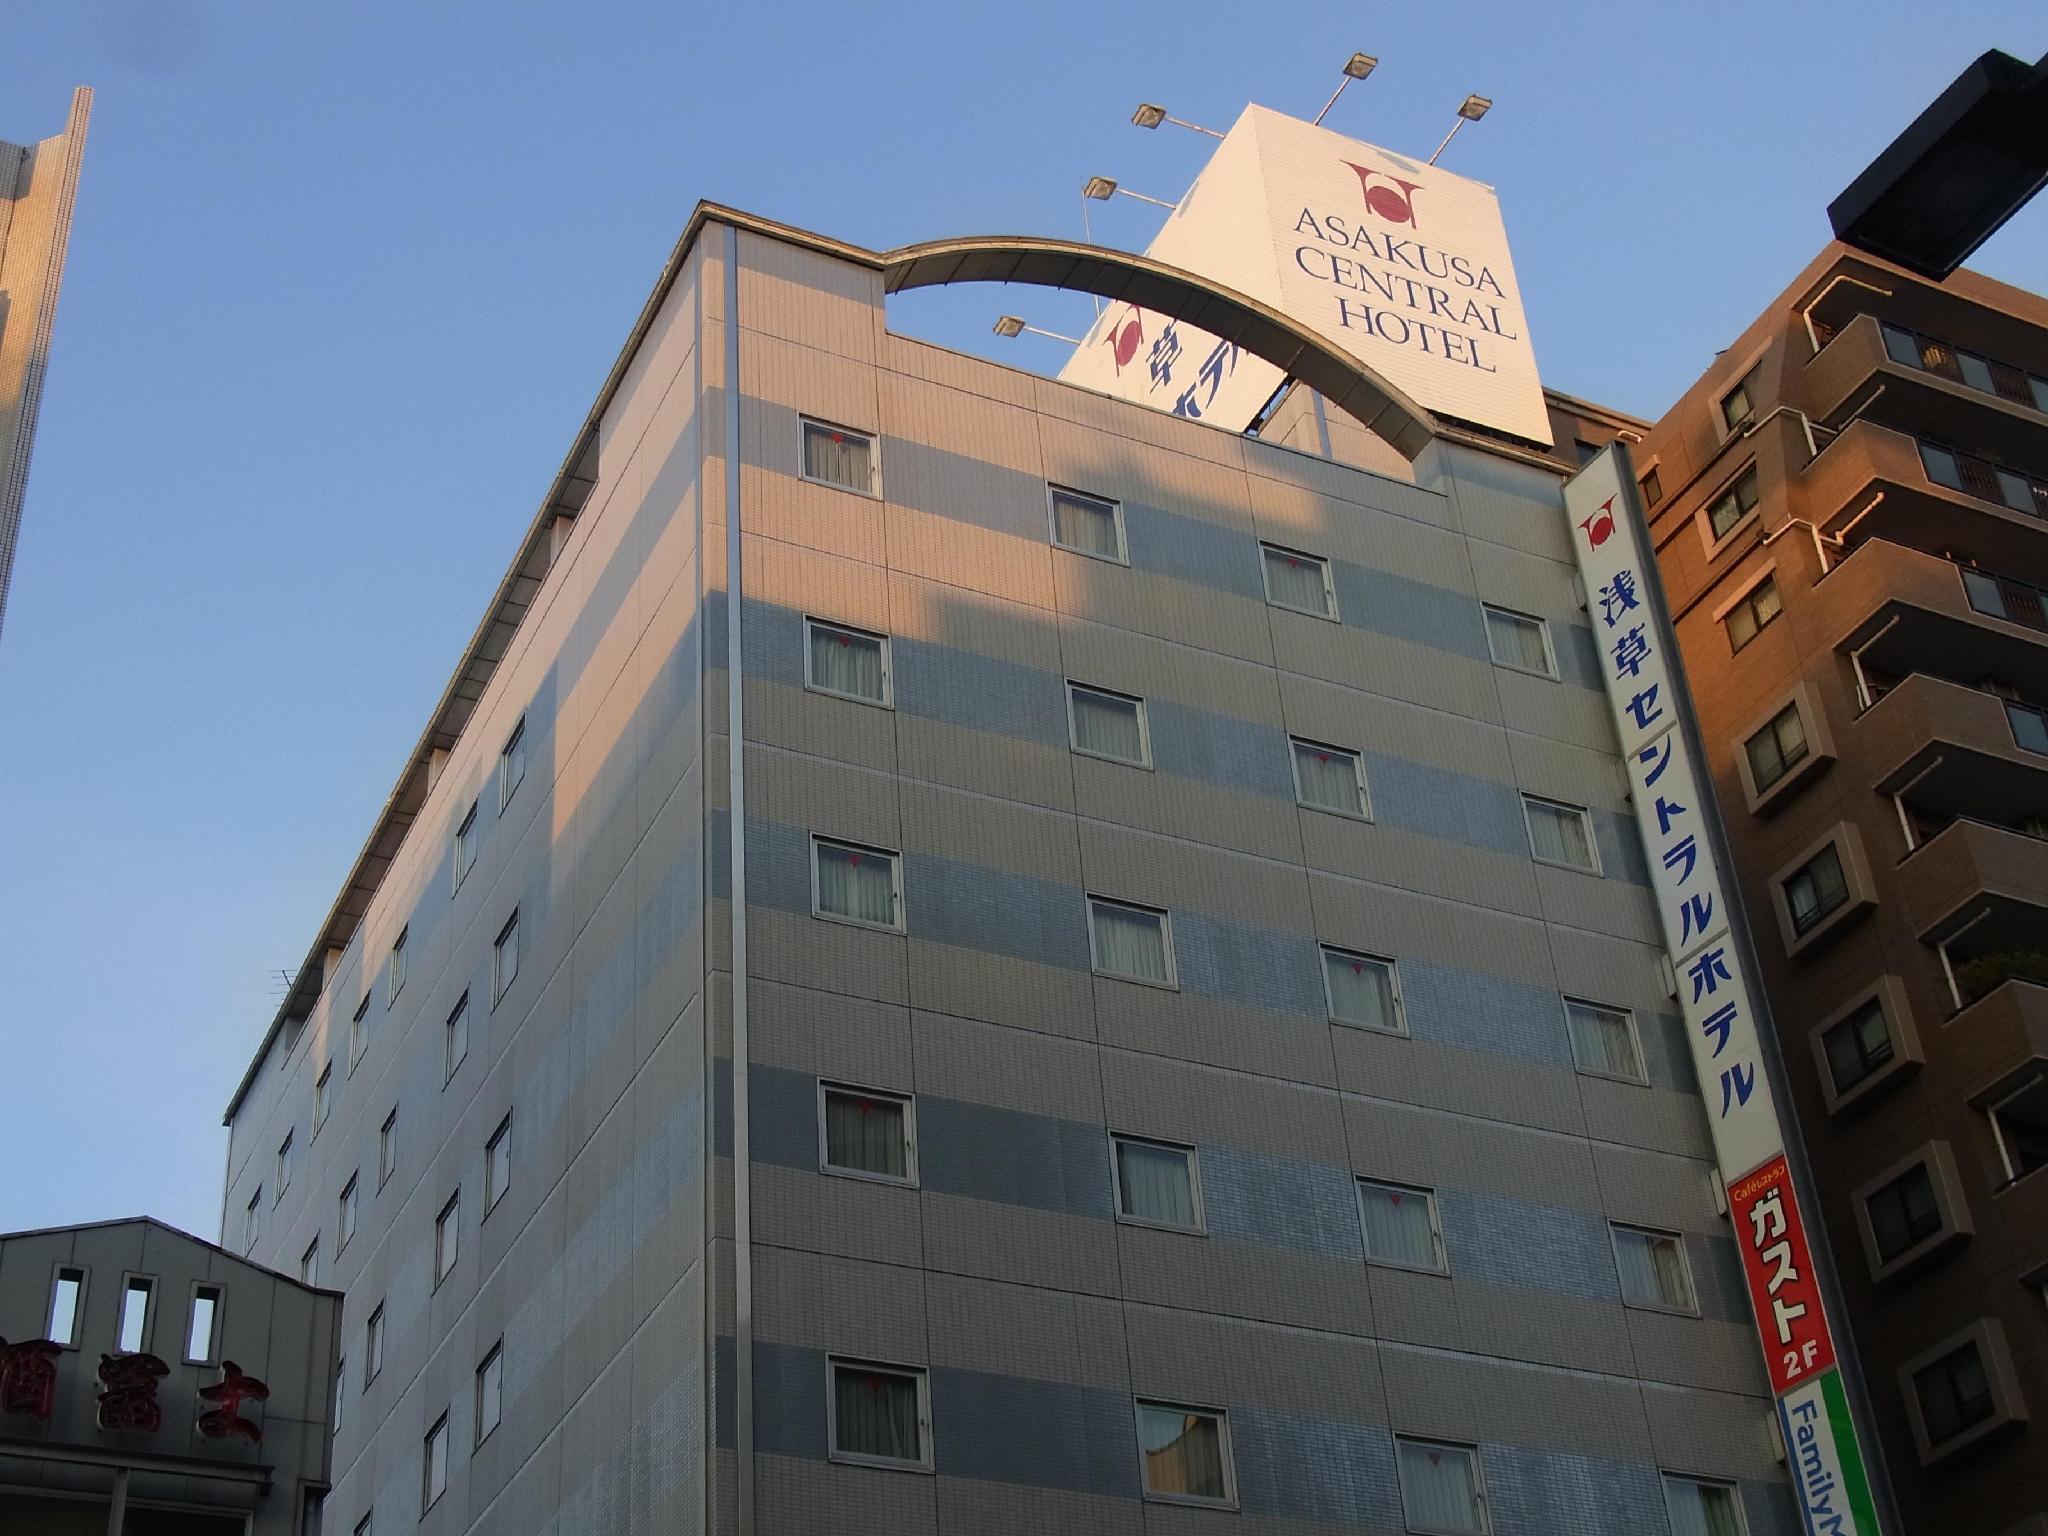 淺草中央酒店 Asakusa Central Hotel